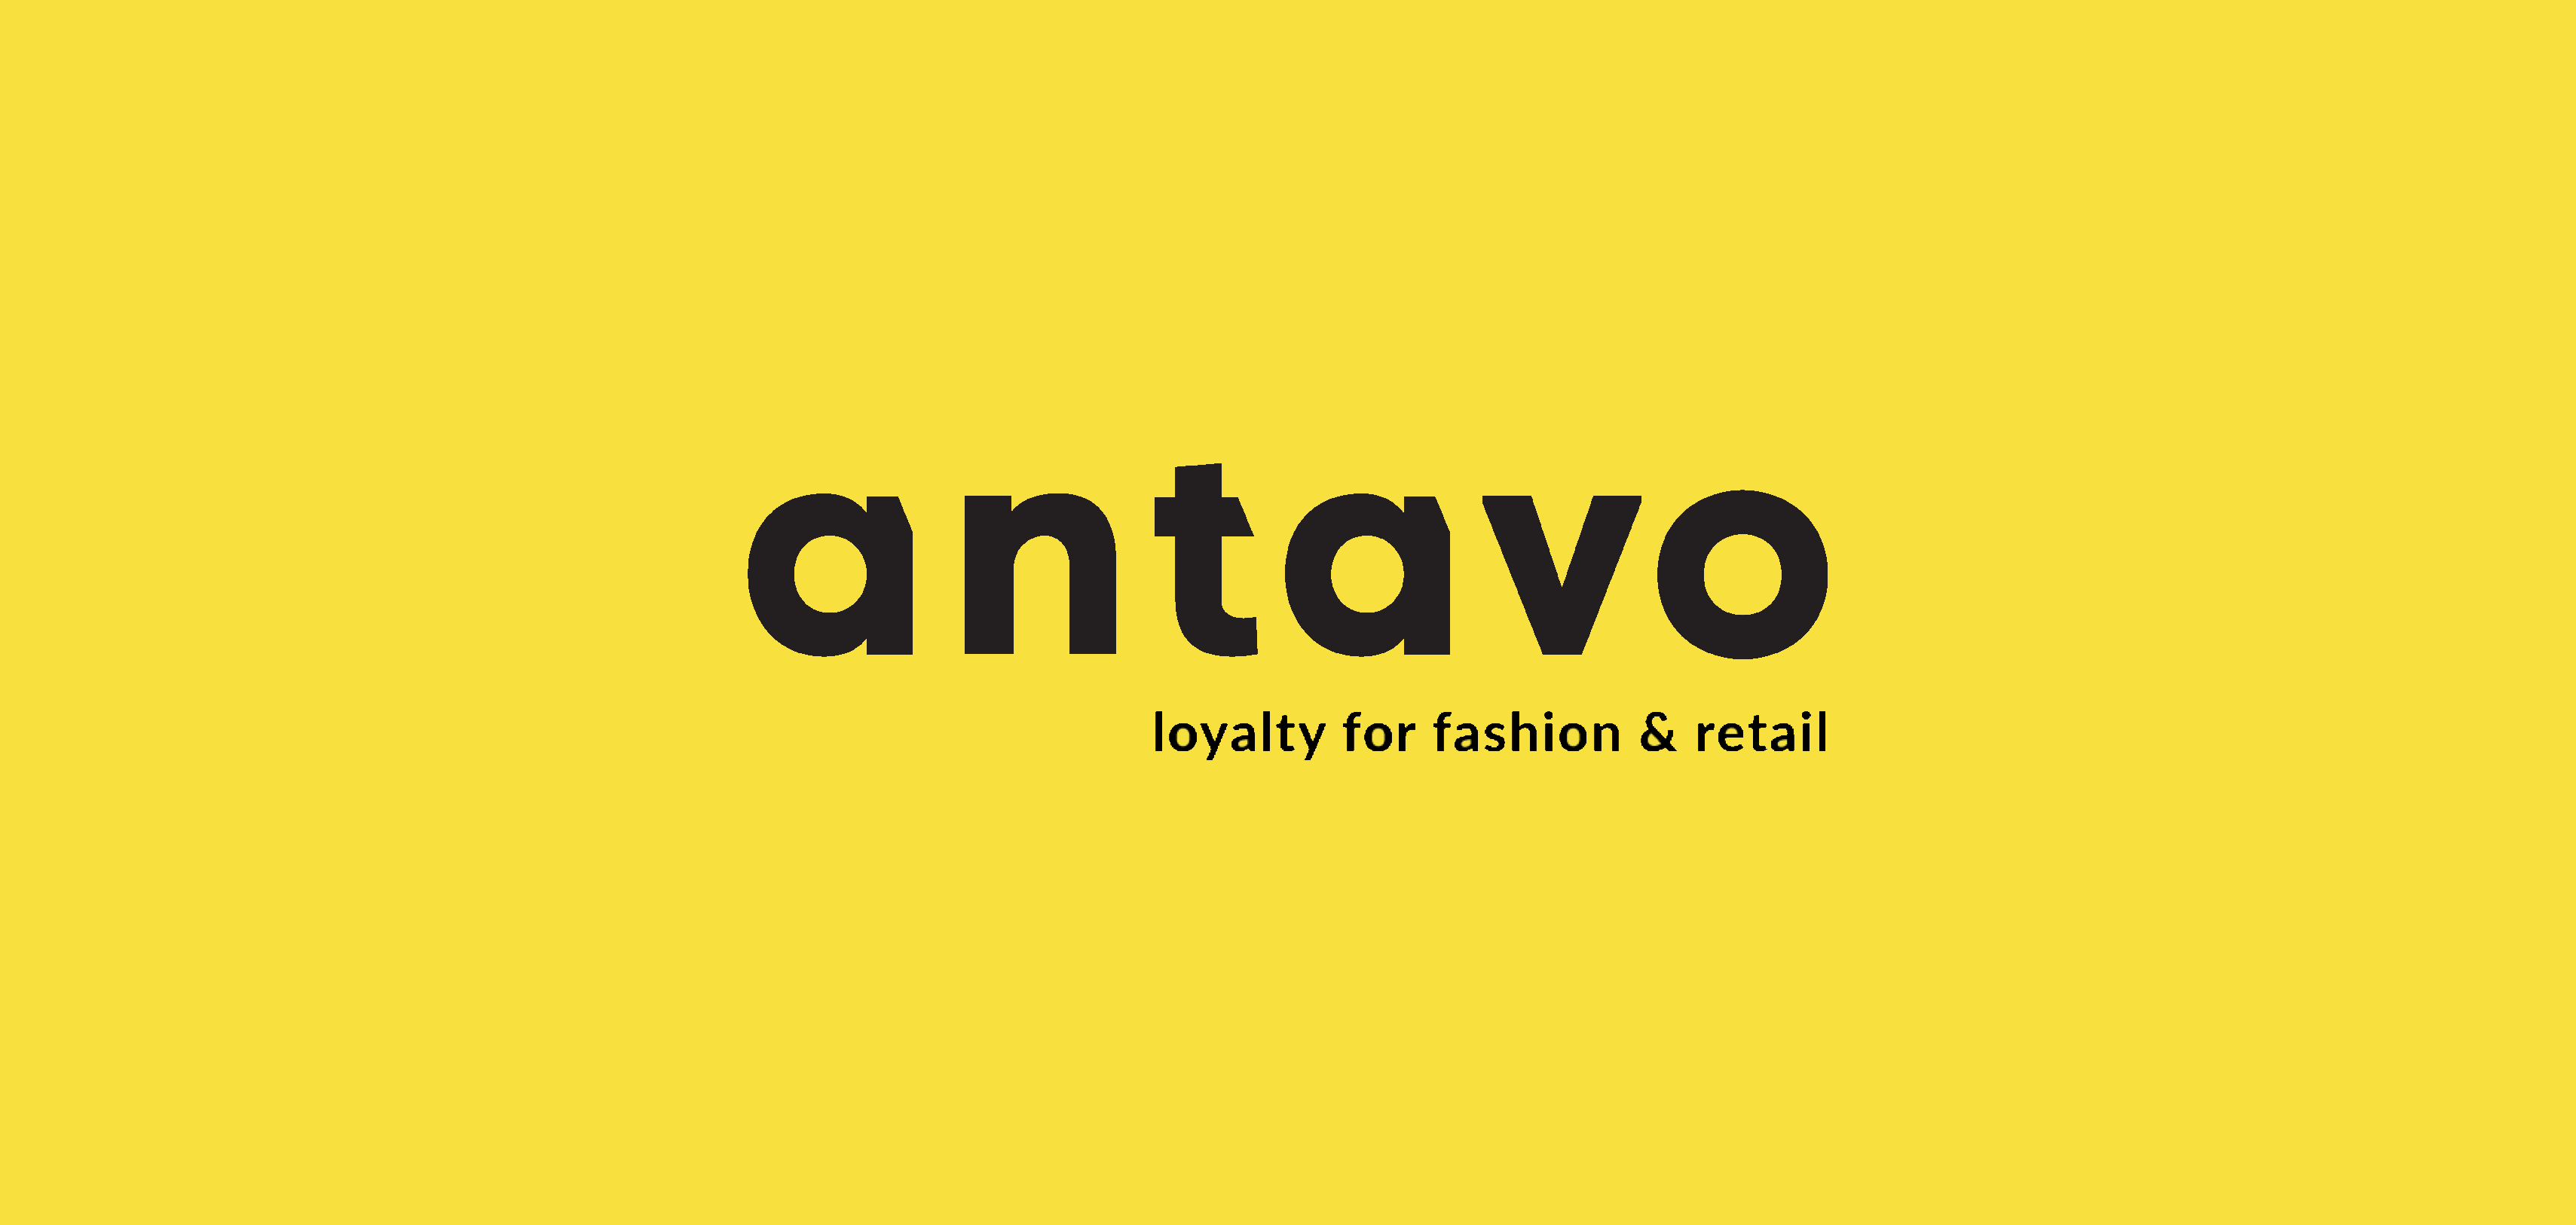 201902_antavo_feature-1